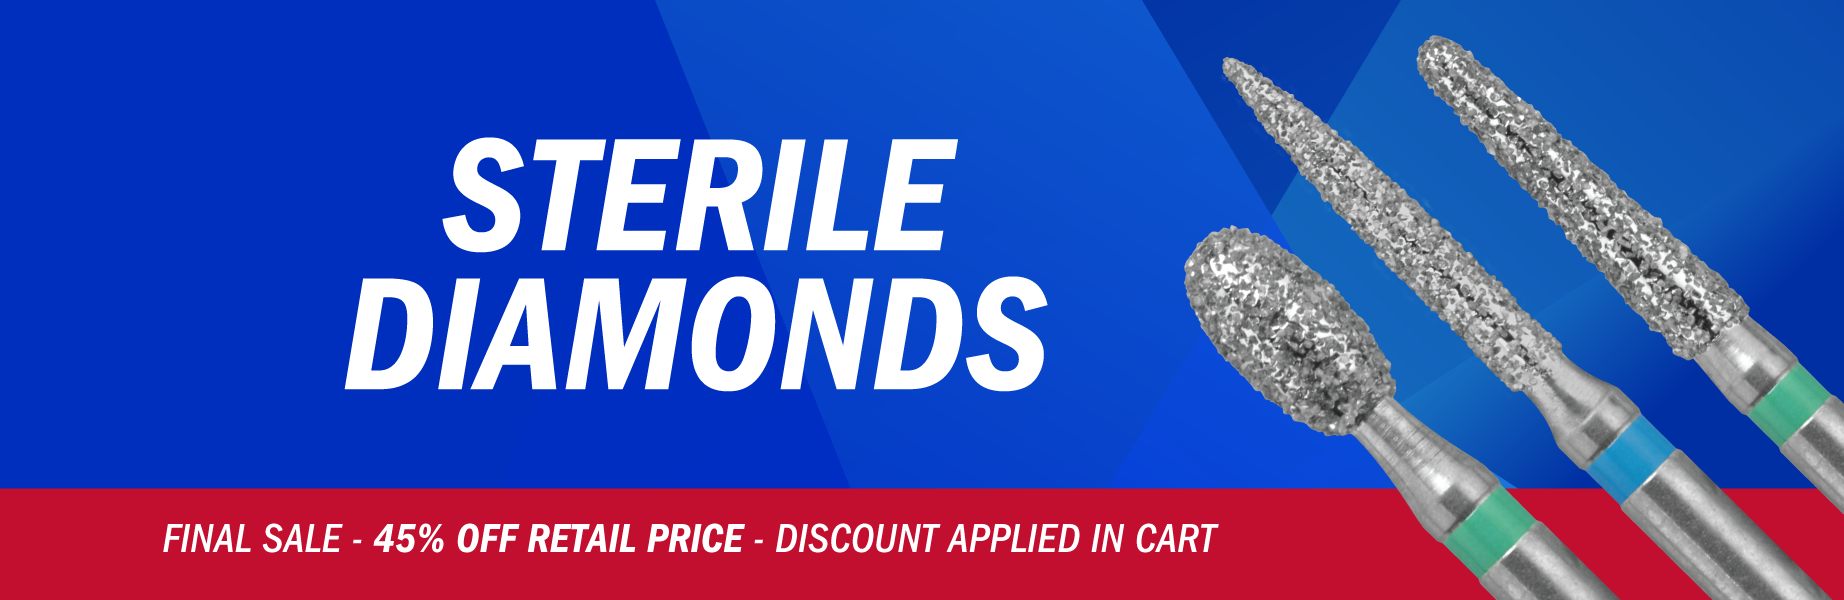 Sterile Diamond Burs from Brasseler USA